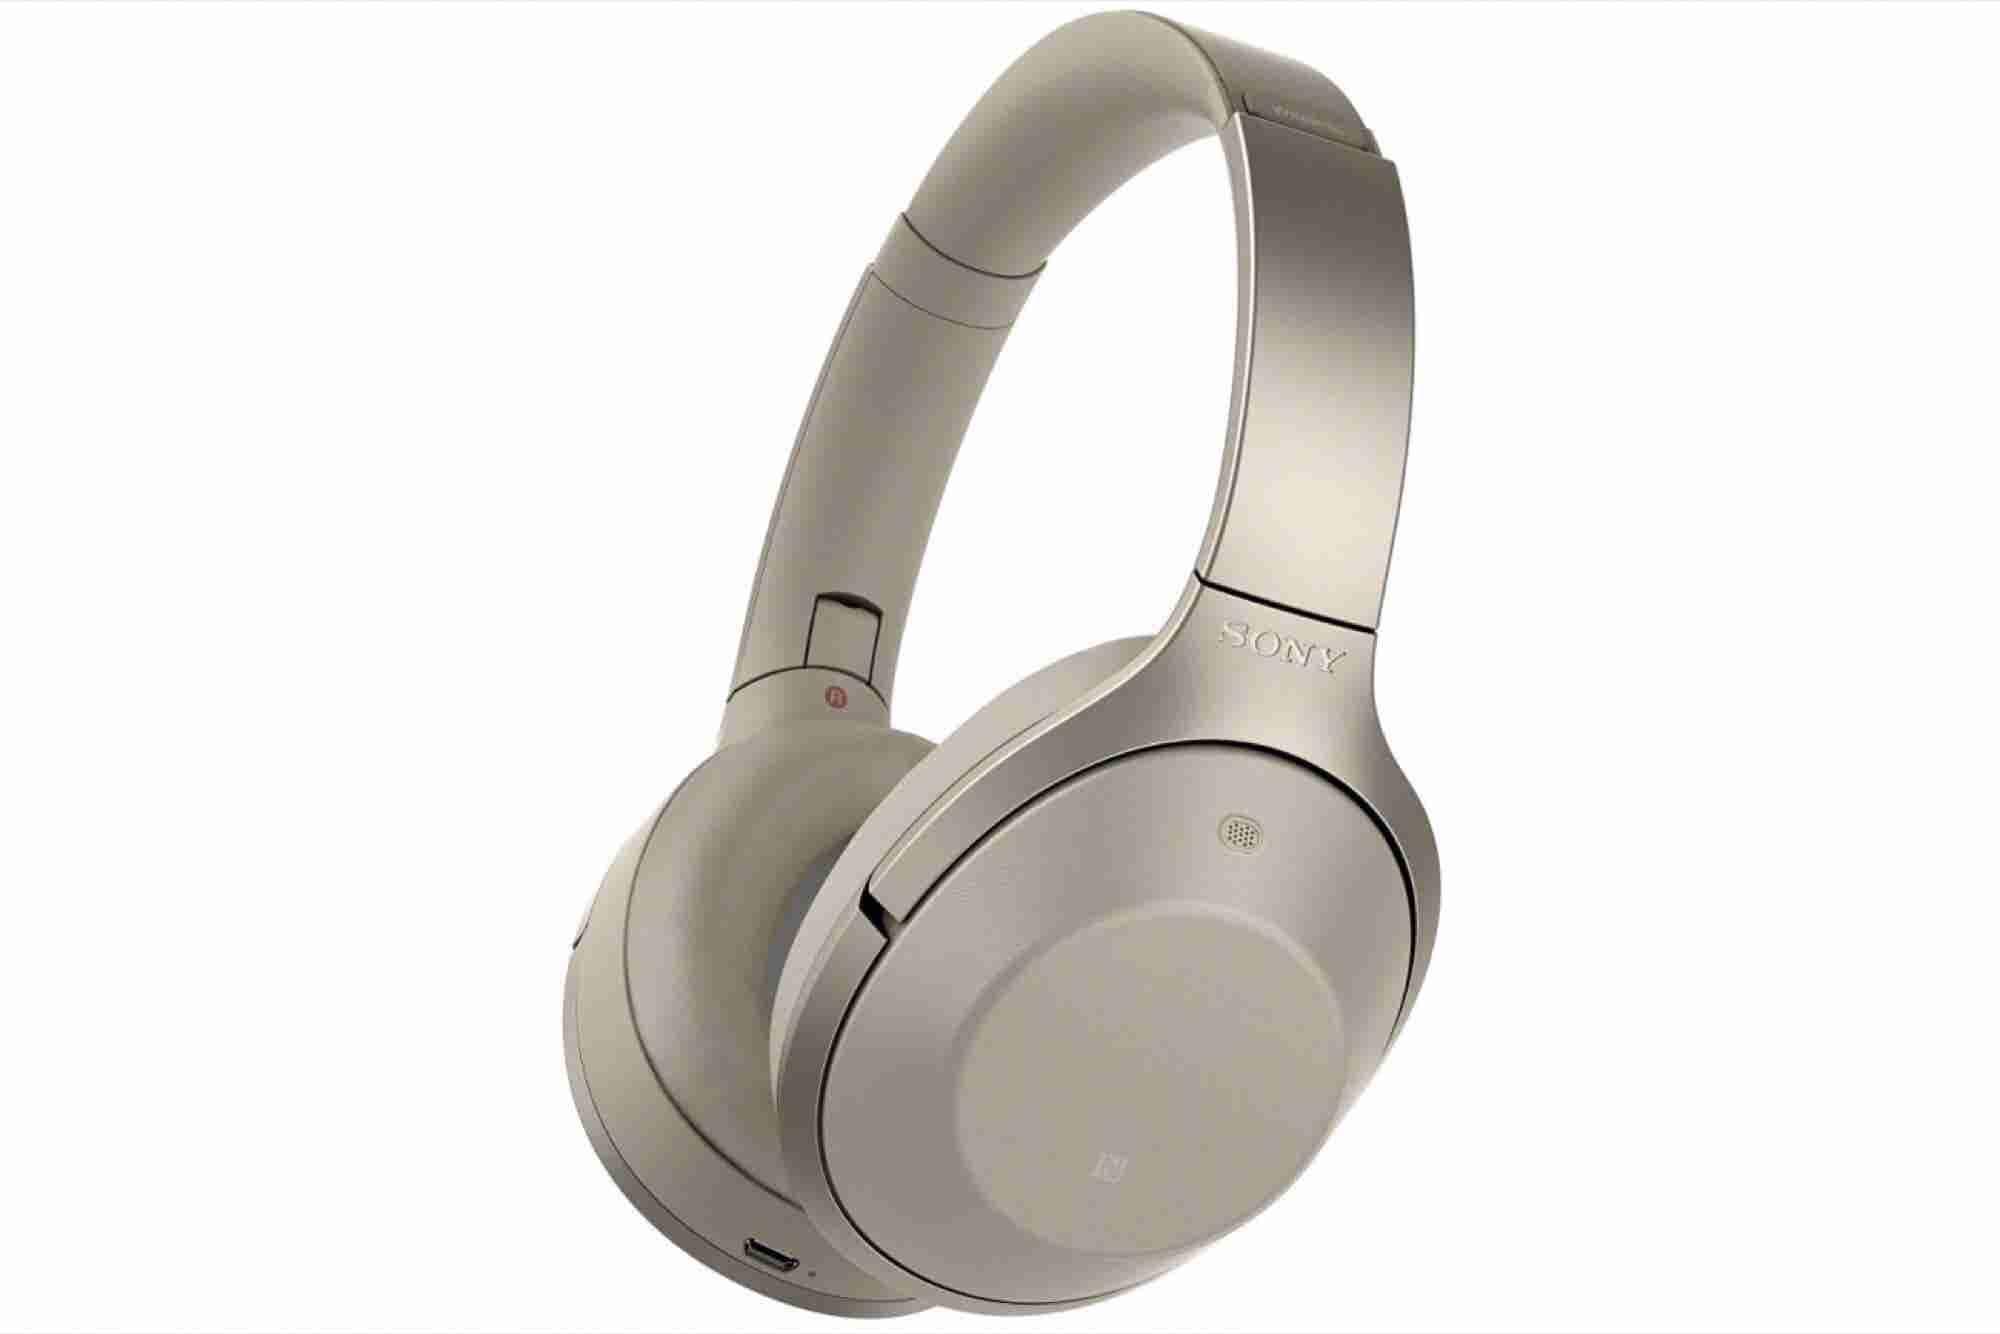 Sony Extends Its Range Of Wireless Noise-Canceling Headphones